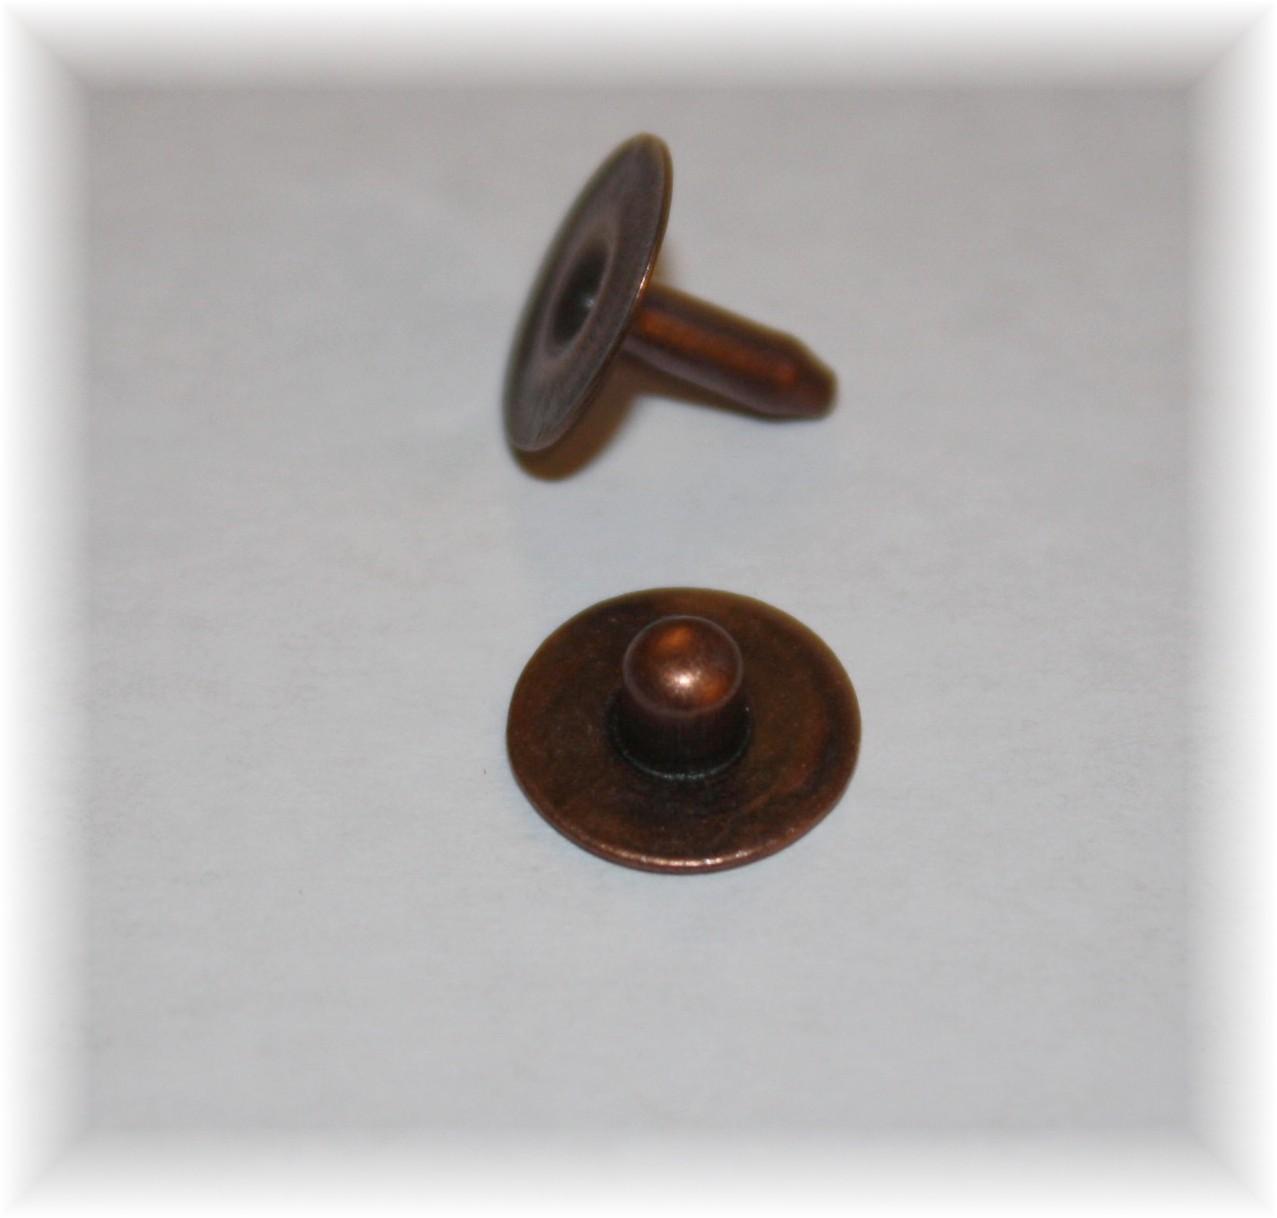 copper-oxide-light-nippel-rivet-angela-wolf-designer-jeans-3.jpg